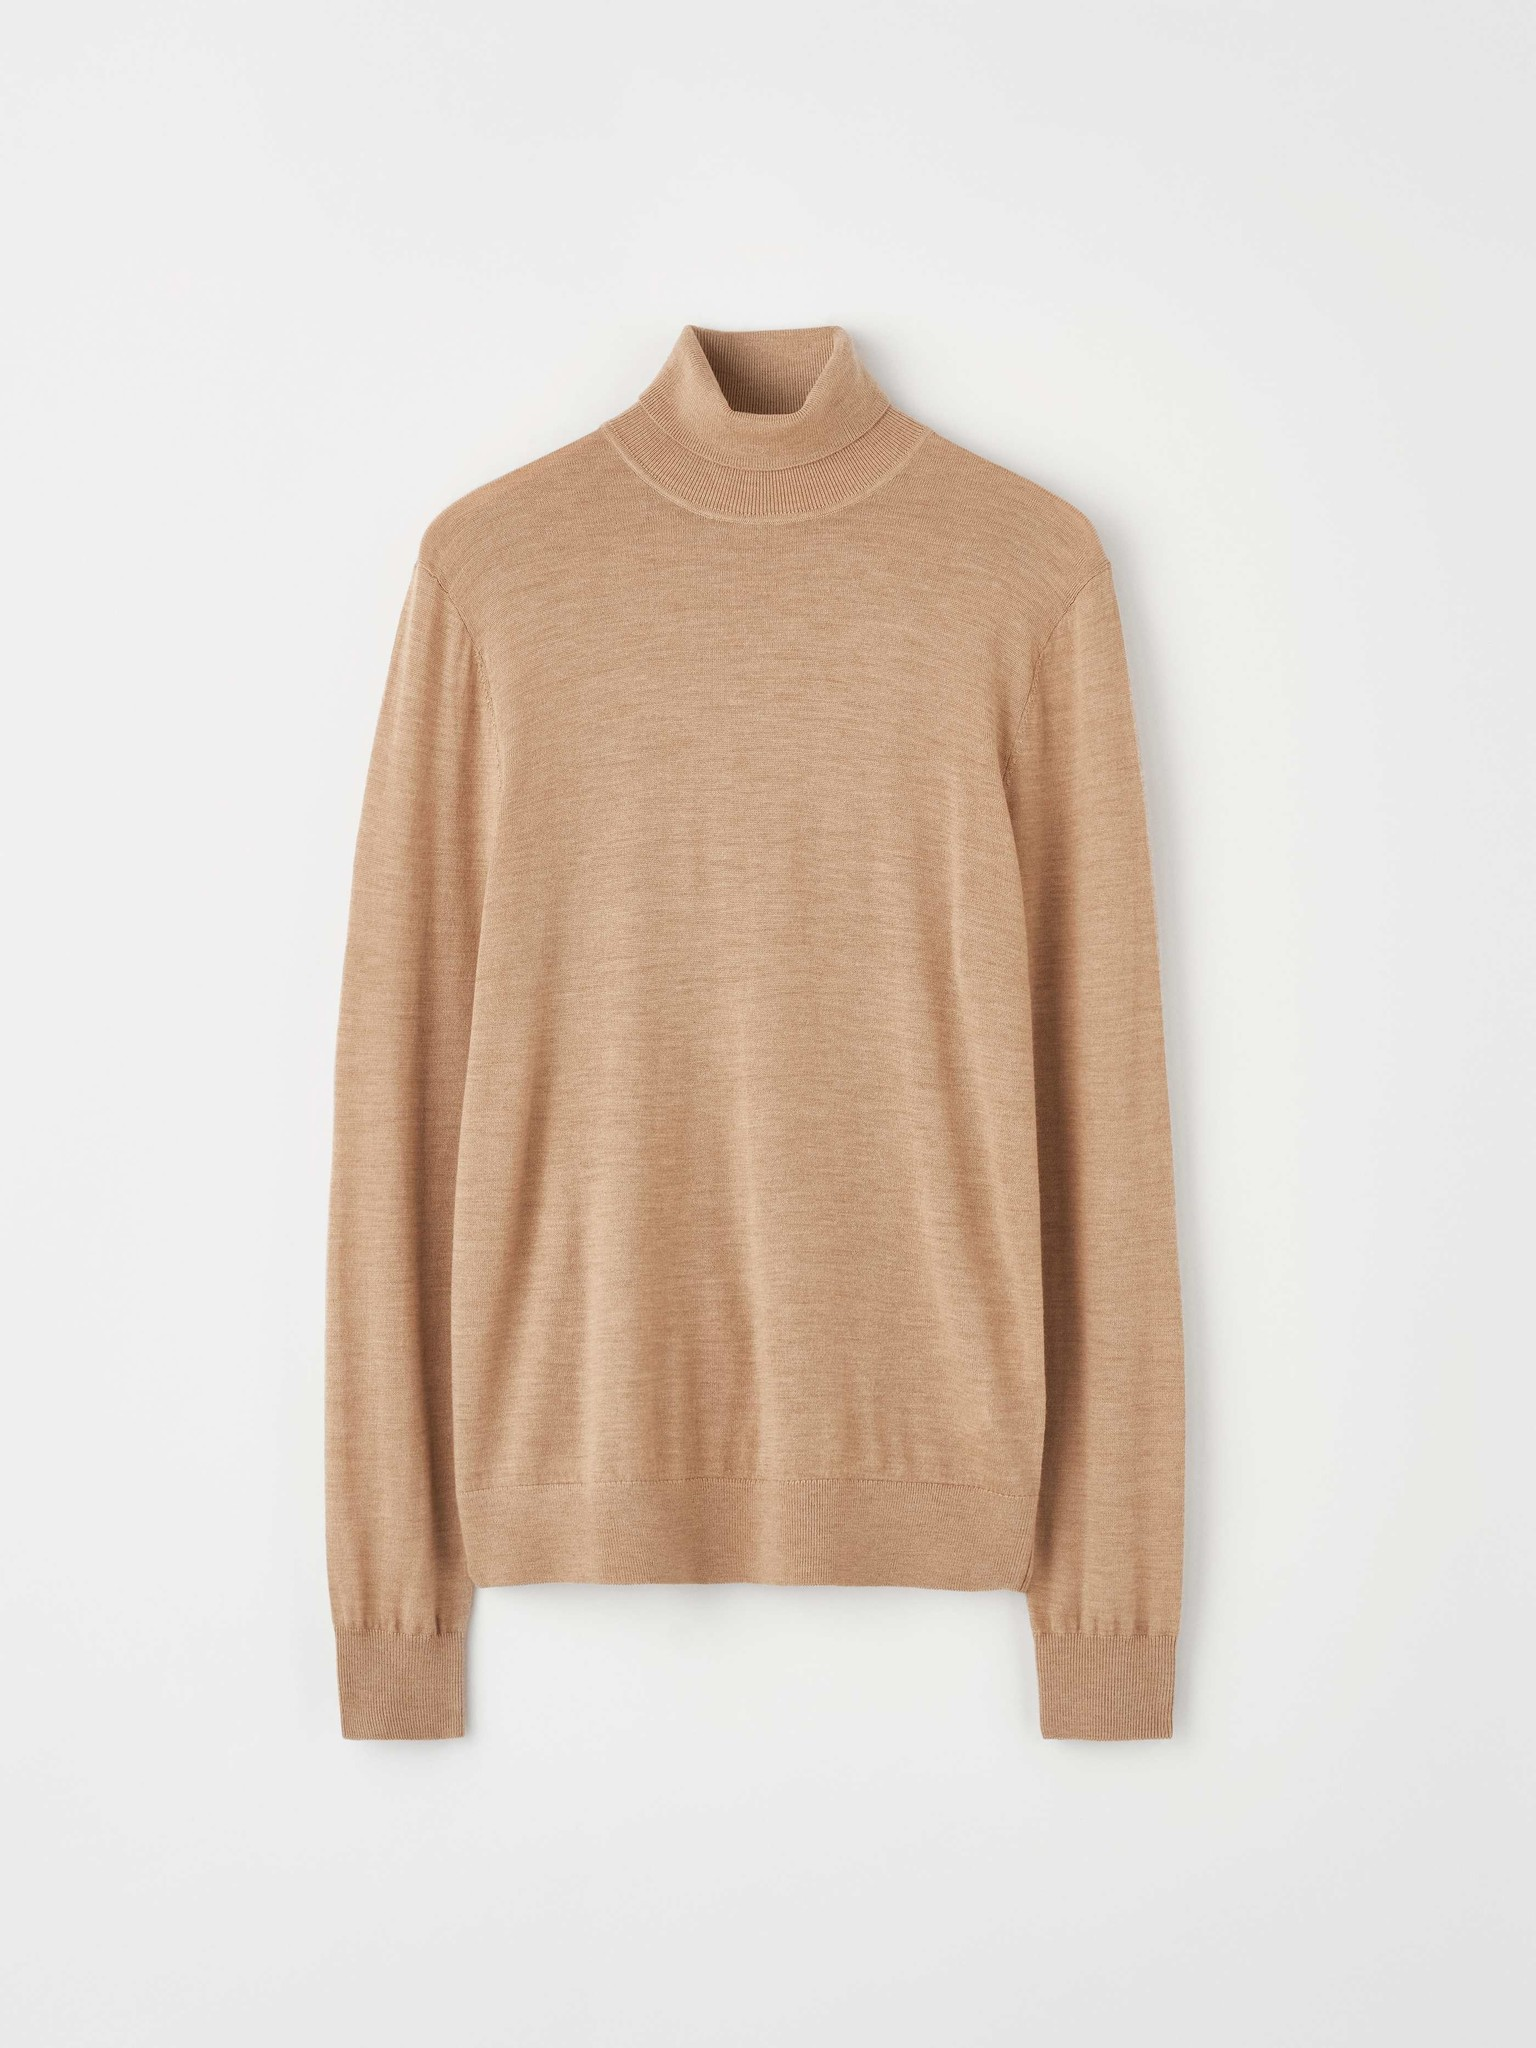 Nevile Macchiato Brown Turtle Neck Wool-2